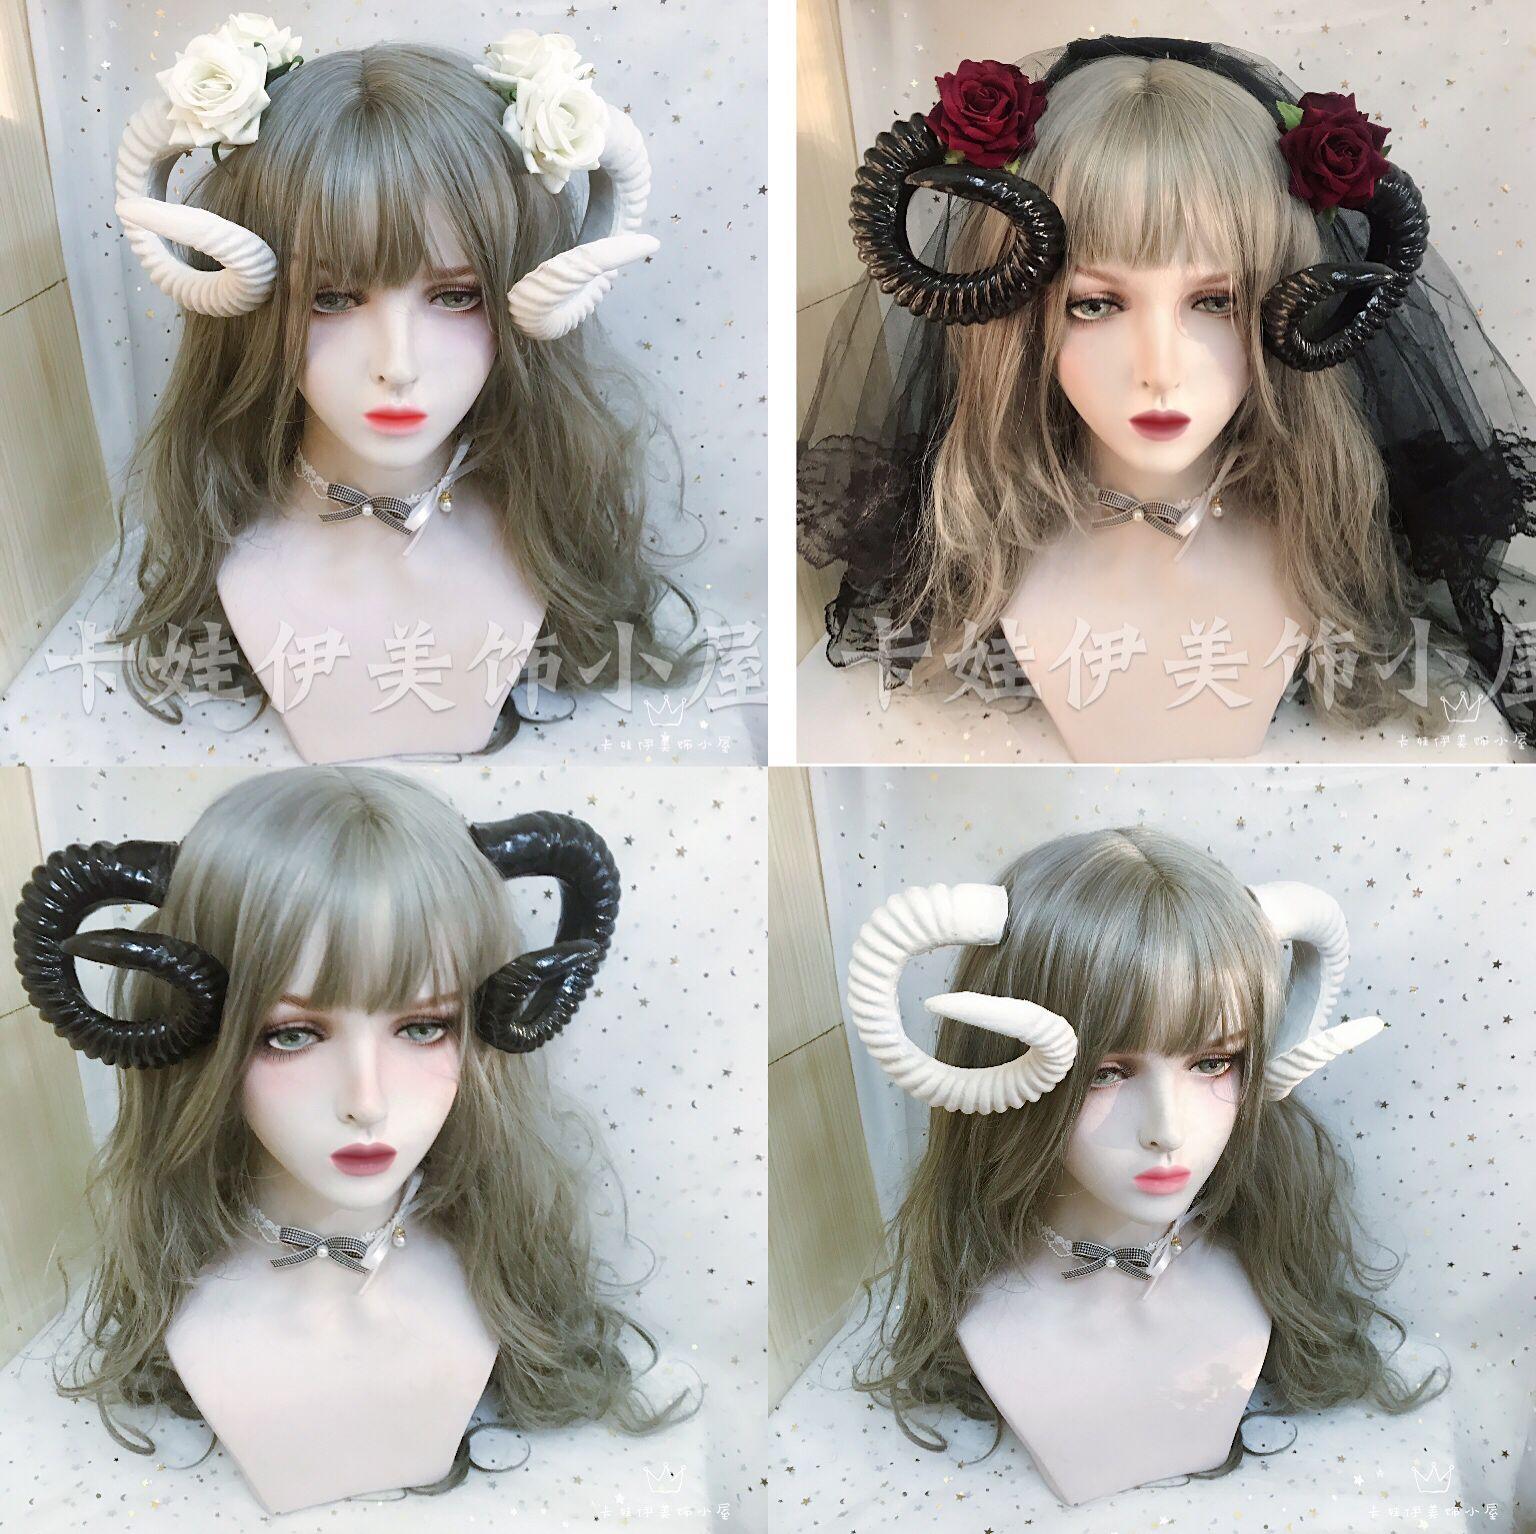 Horquillas de cuerno de oveja Cosplay tocado gótico Lolita Mori chica Halloween par Clip KC accesorios para el cabello accesorios para mascarada